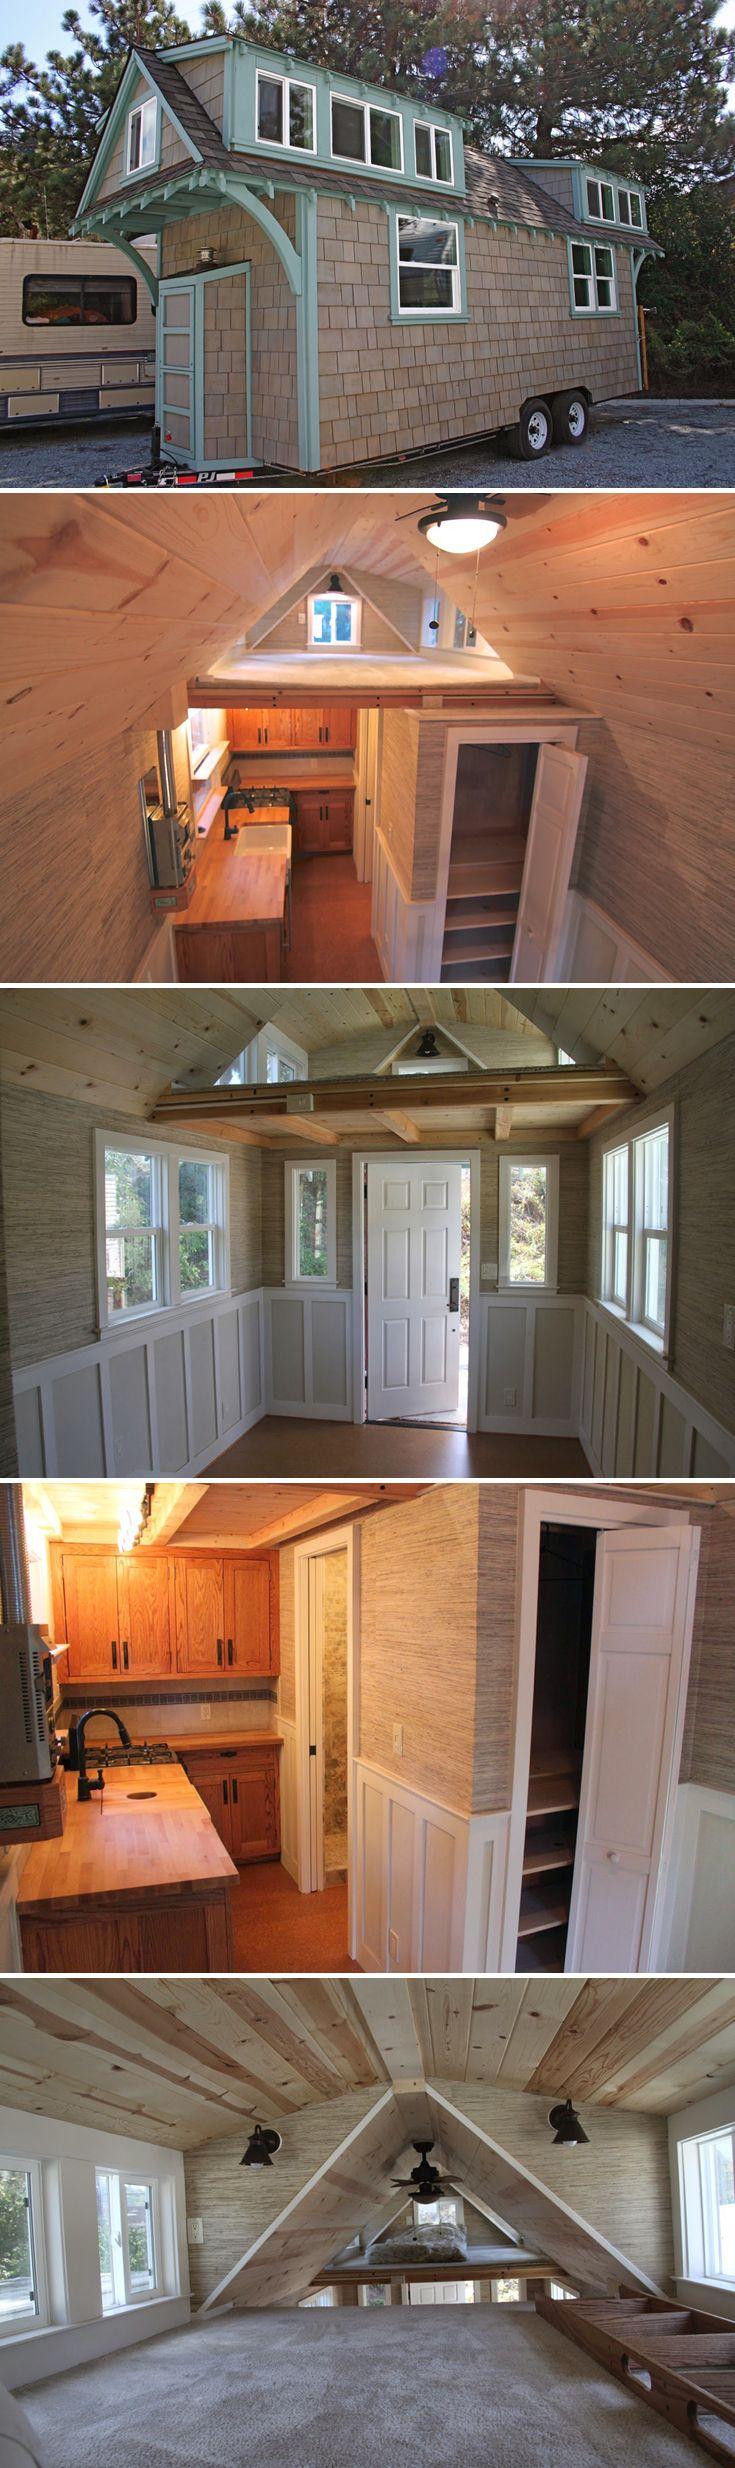 Dormer Loft Cottage By Molecule Tiny Homes: Craftsman Bungalow By Molecule Tiny Homes